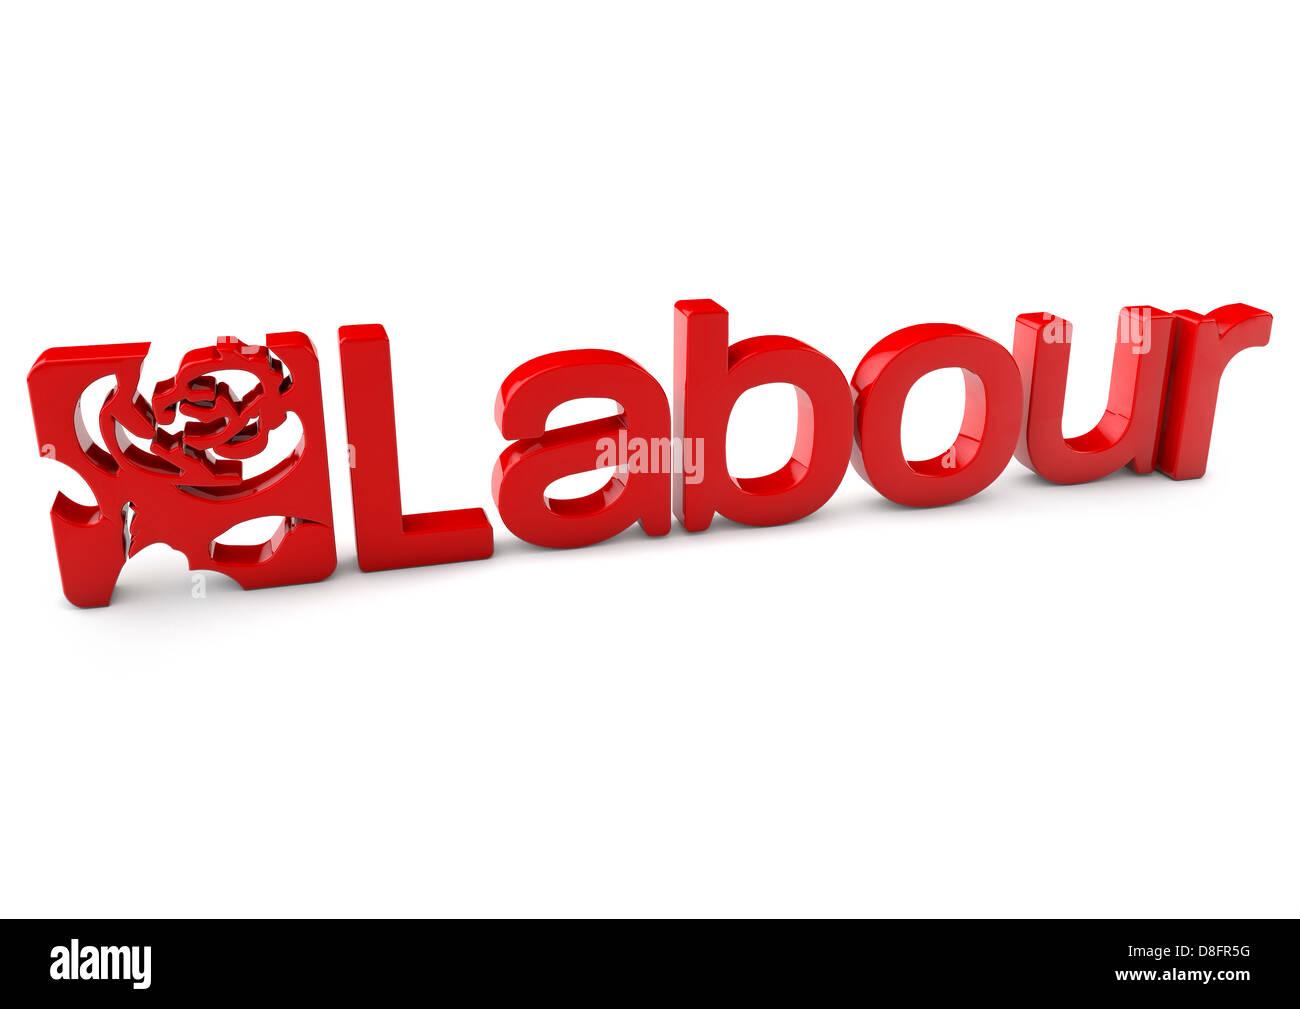 Labour Party logo - Stock Image